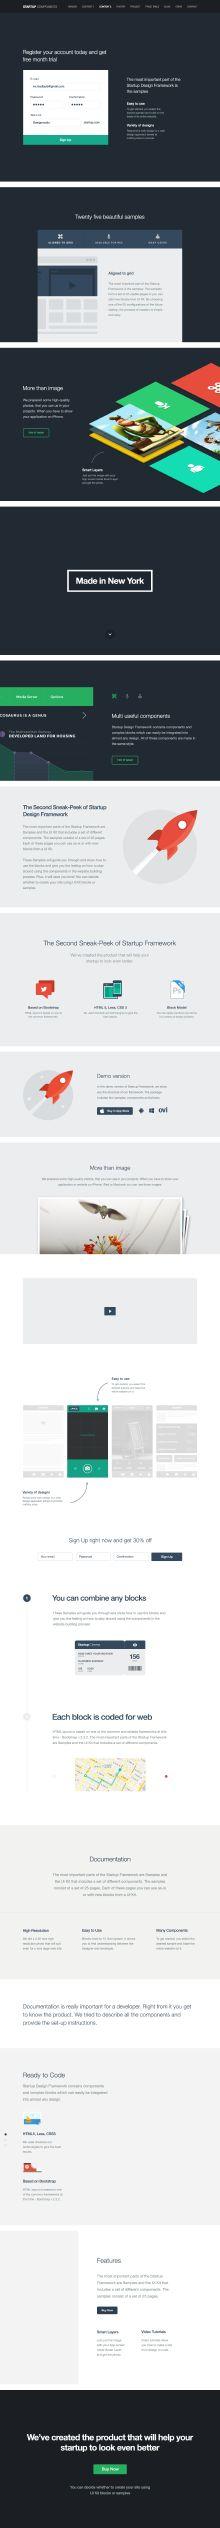 Startup Design Framework - Designmodo